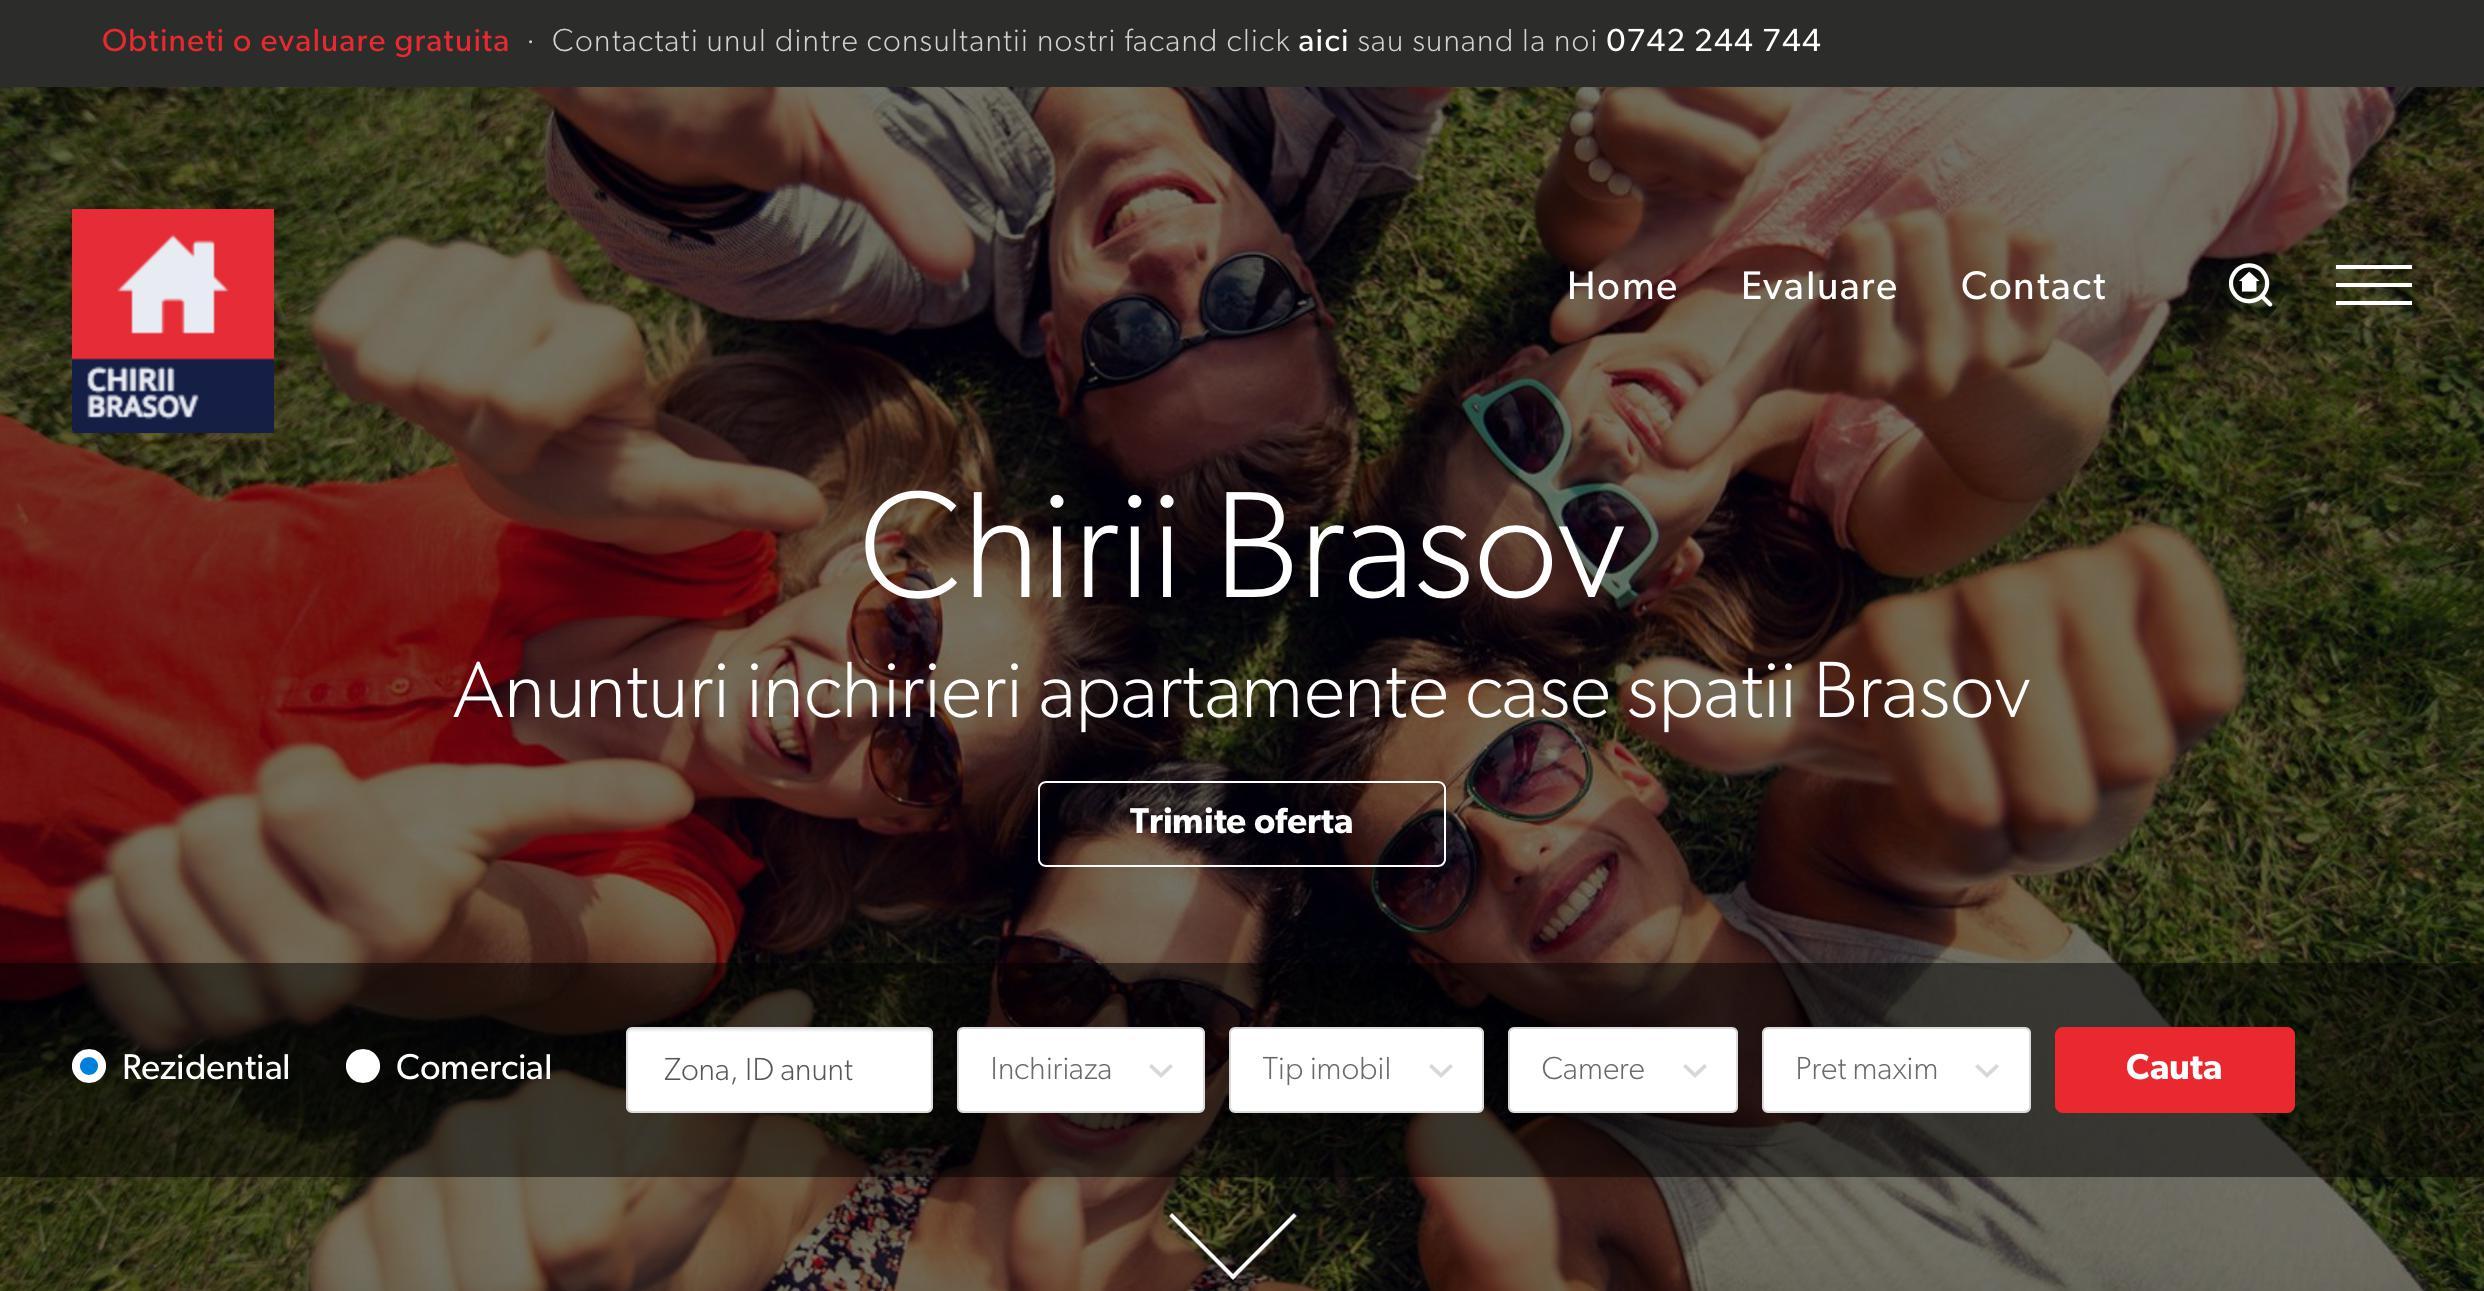 Chirii Brasov - Agentie Imobiliara Brasov de Inchirieri  - Chirii Brasov